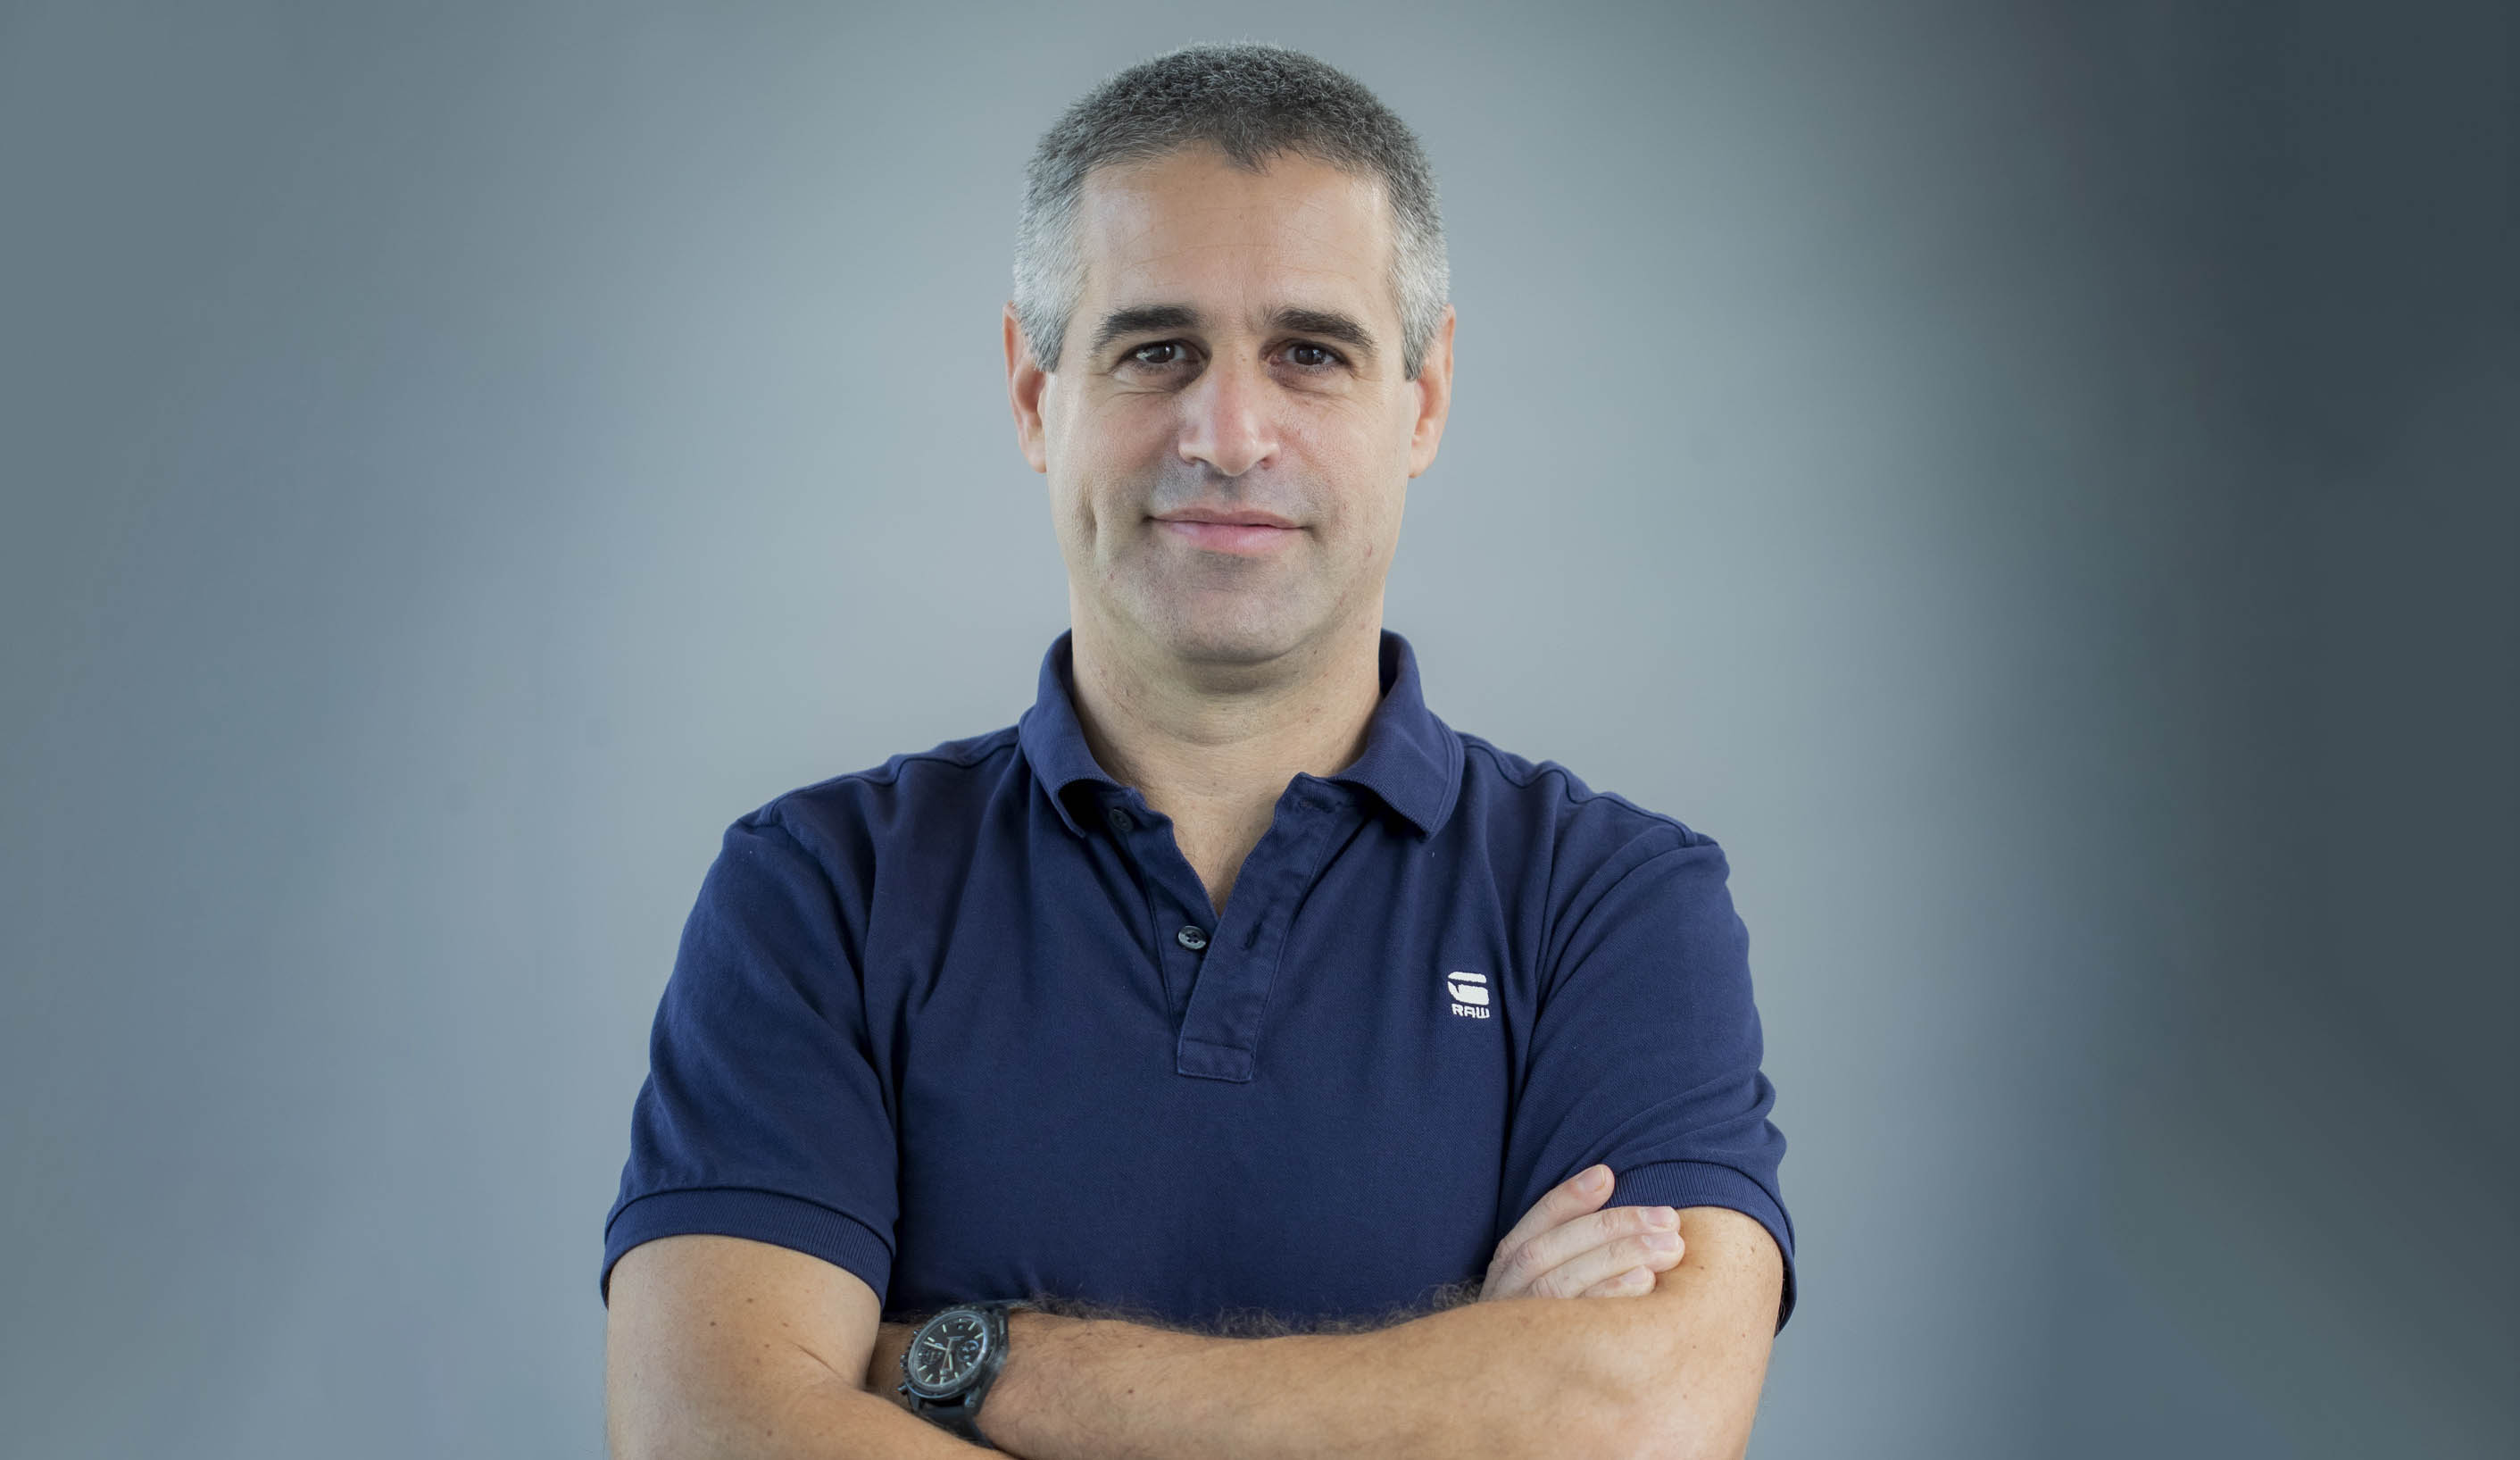 Boaz Zilberman Joins AccessFintech as Executive Vice President for Business Development